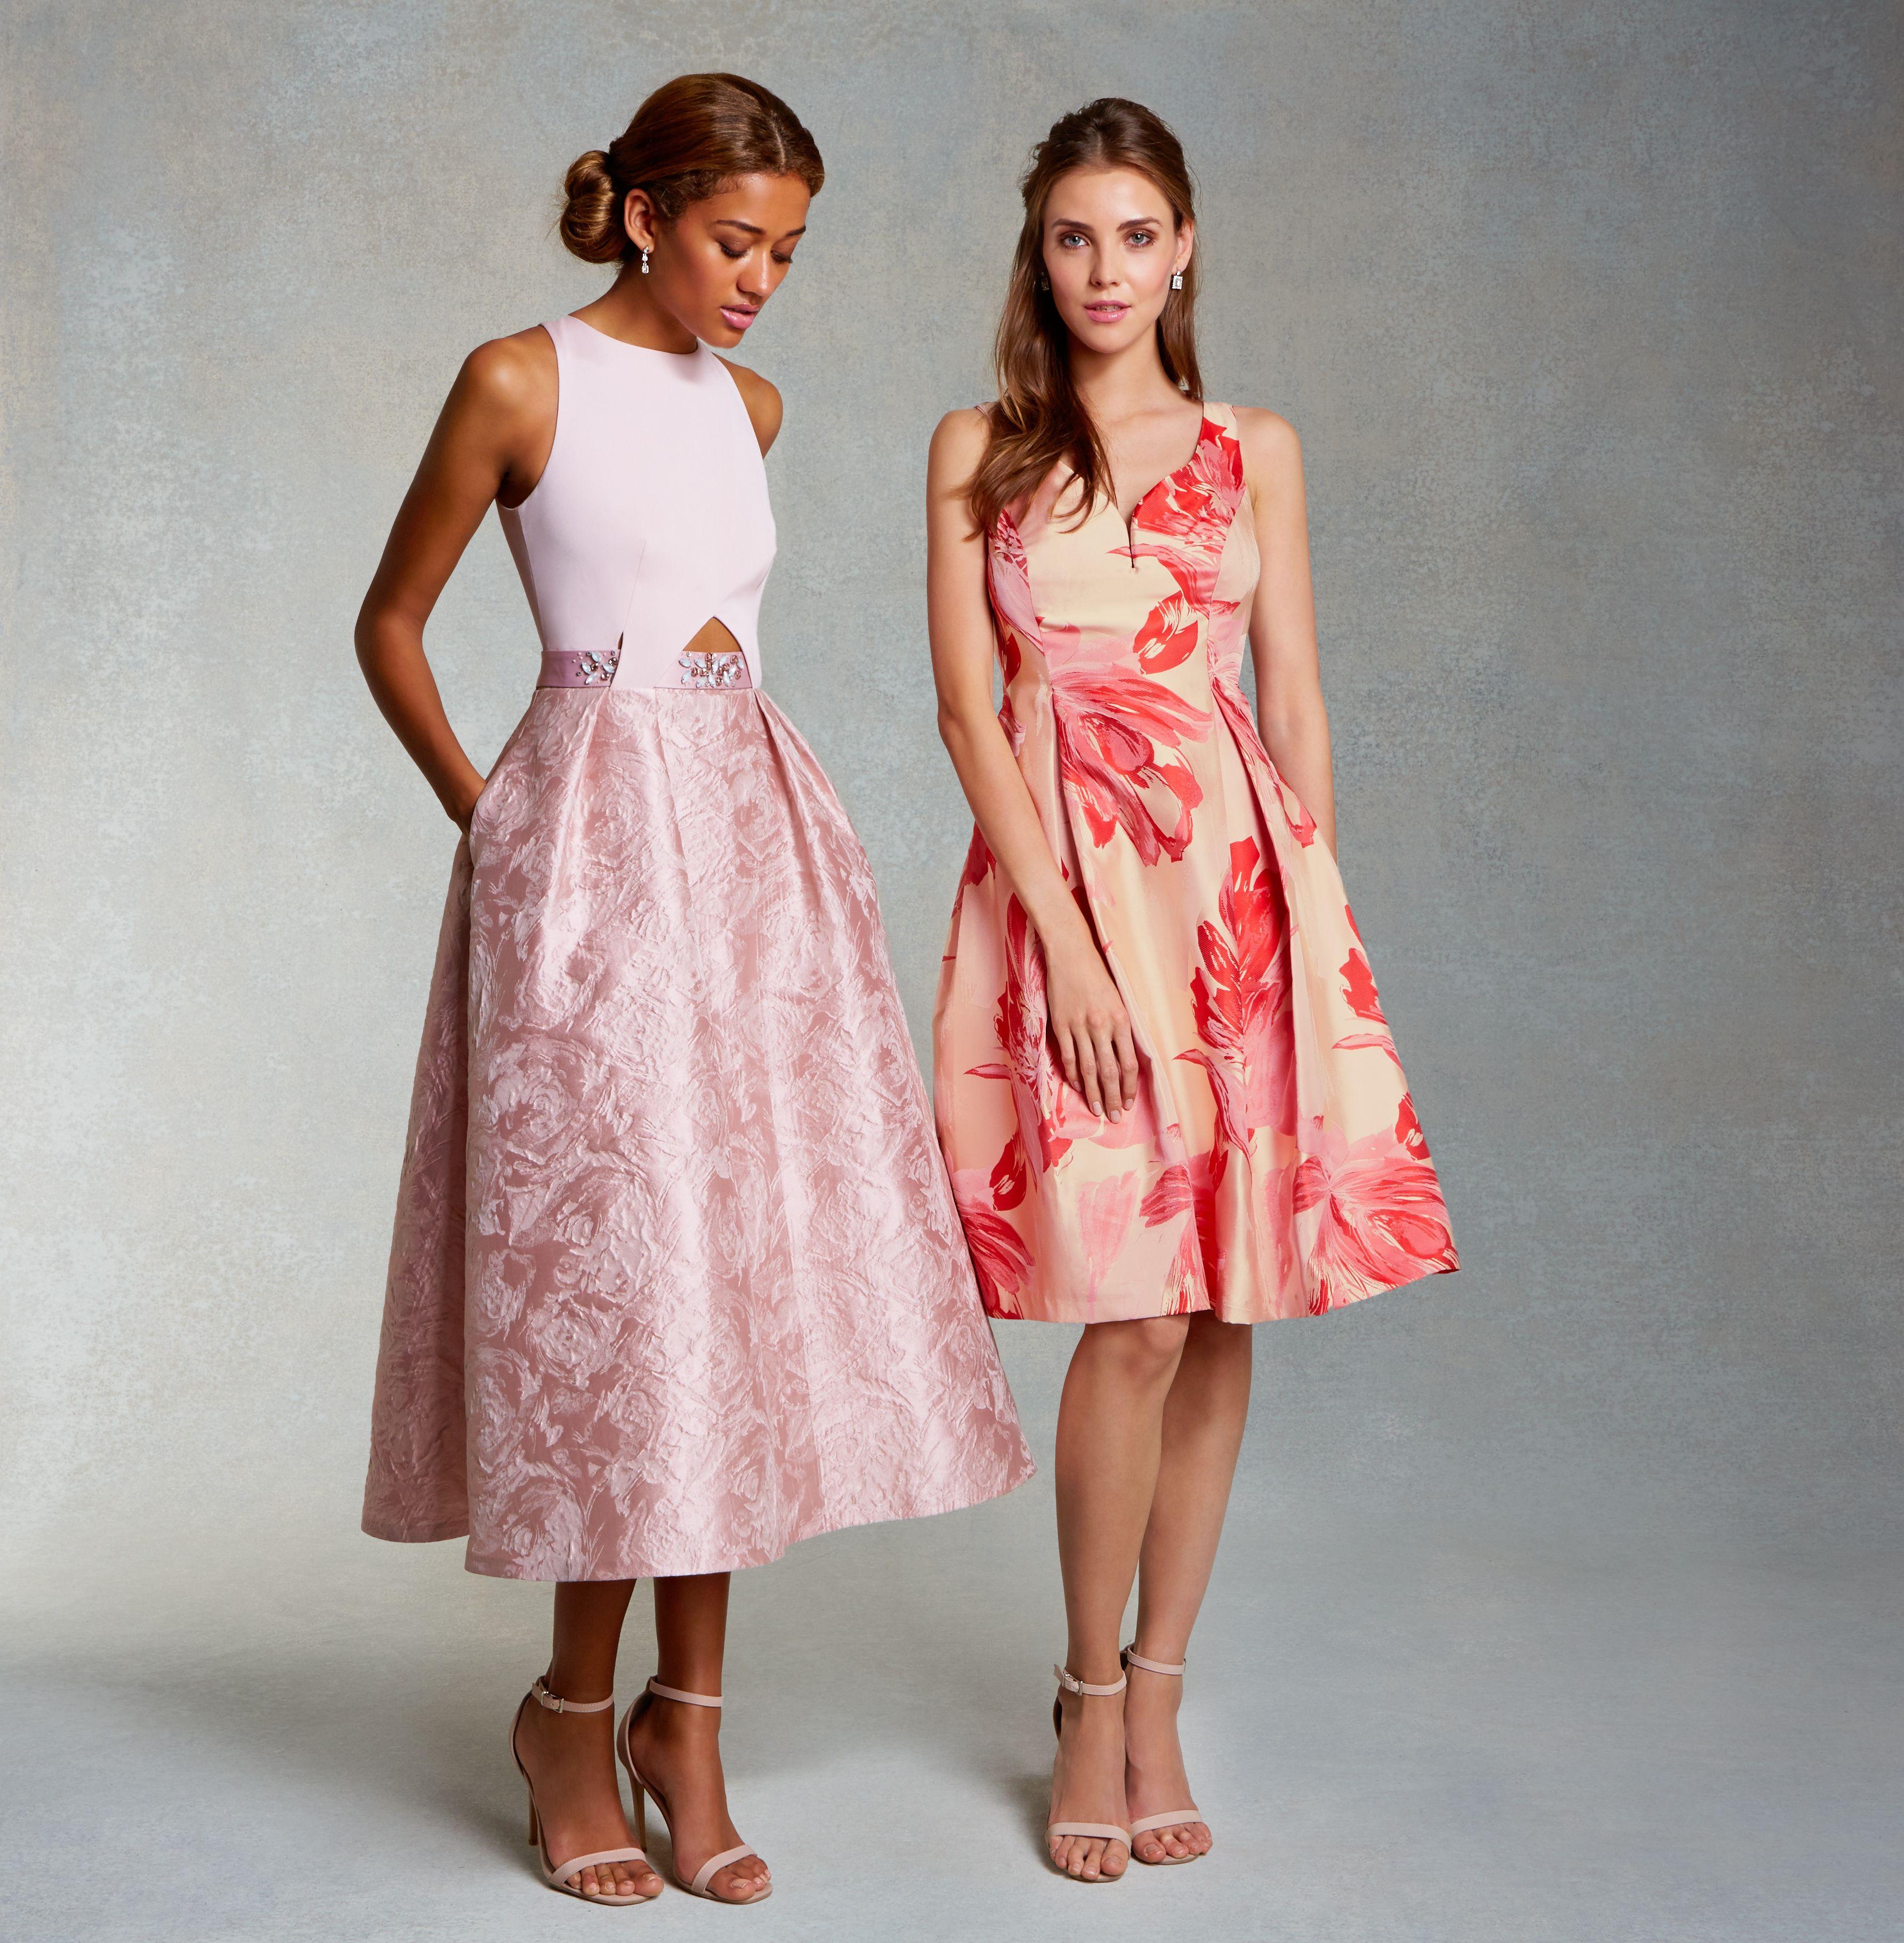 Pin von Ciiru Munyi auf Bridesmaid Dresses | Pinterest | Outfit ...